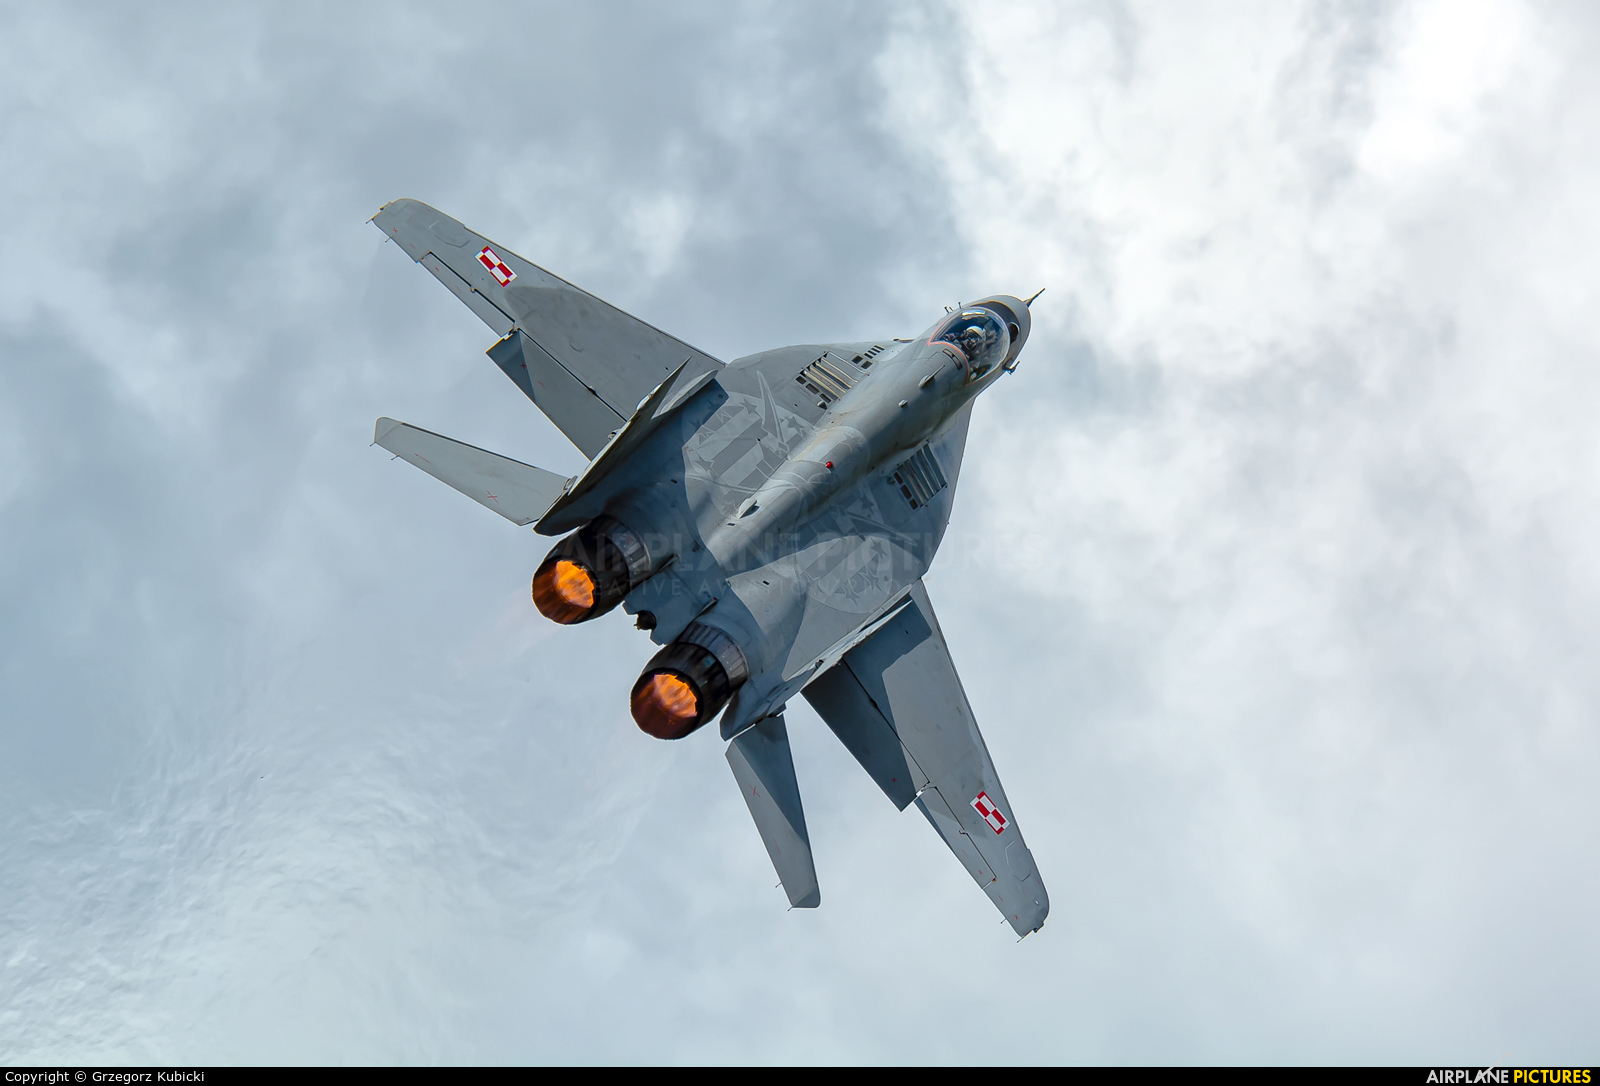 Poland - Air Force 54 aircraft at Mińsk Mazowiecki